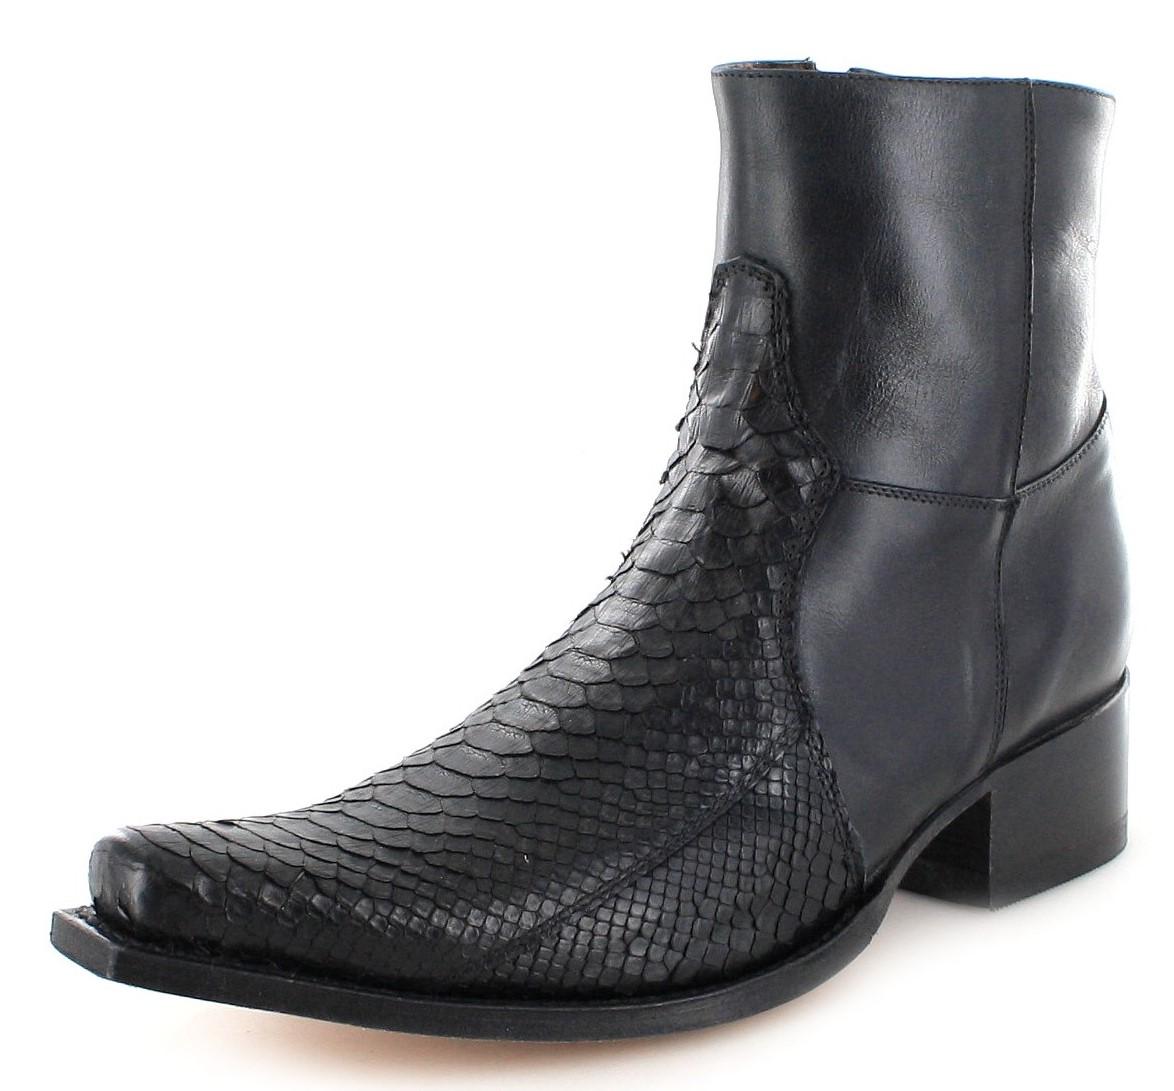 Sendra Boots 5701P Negro Fashion Exotic ankle boot - black